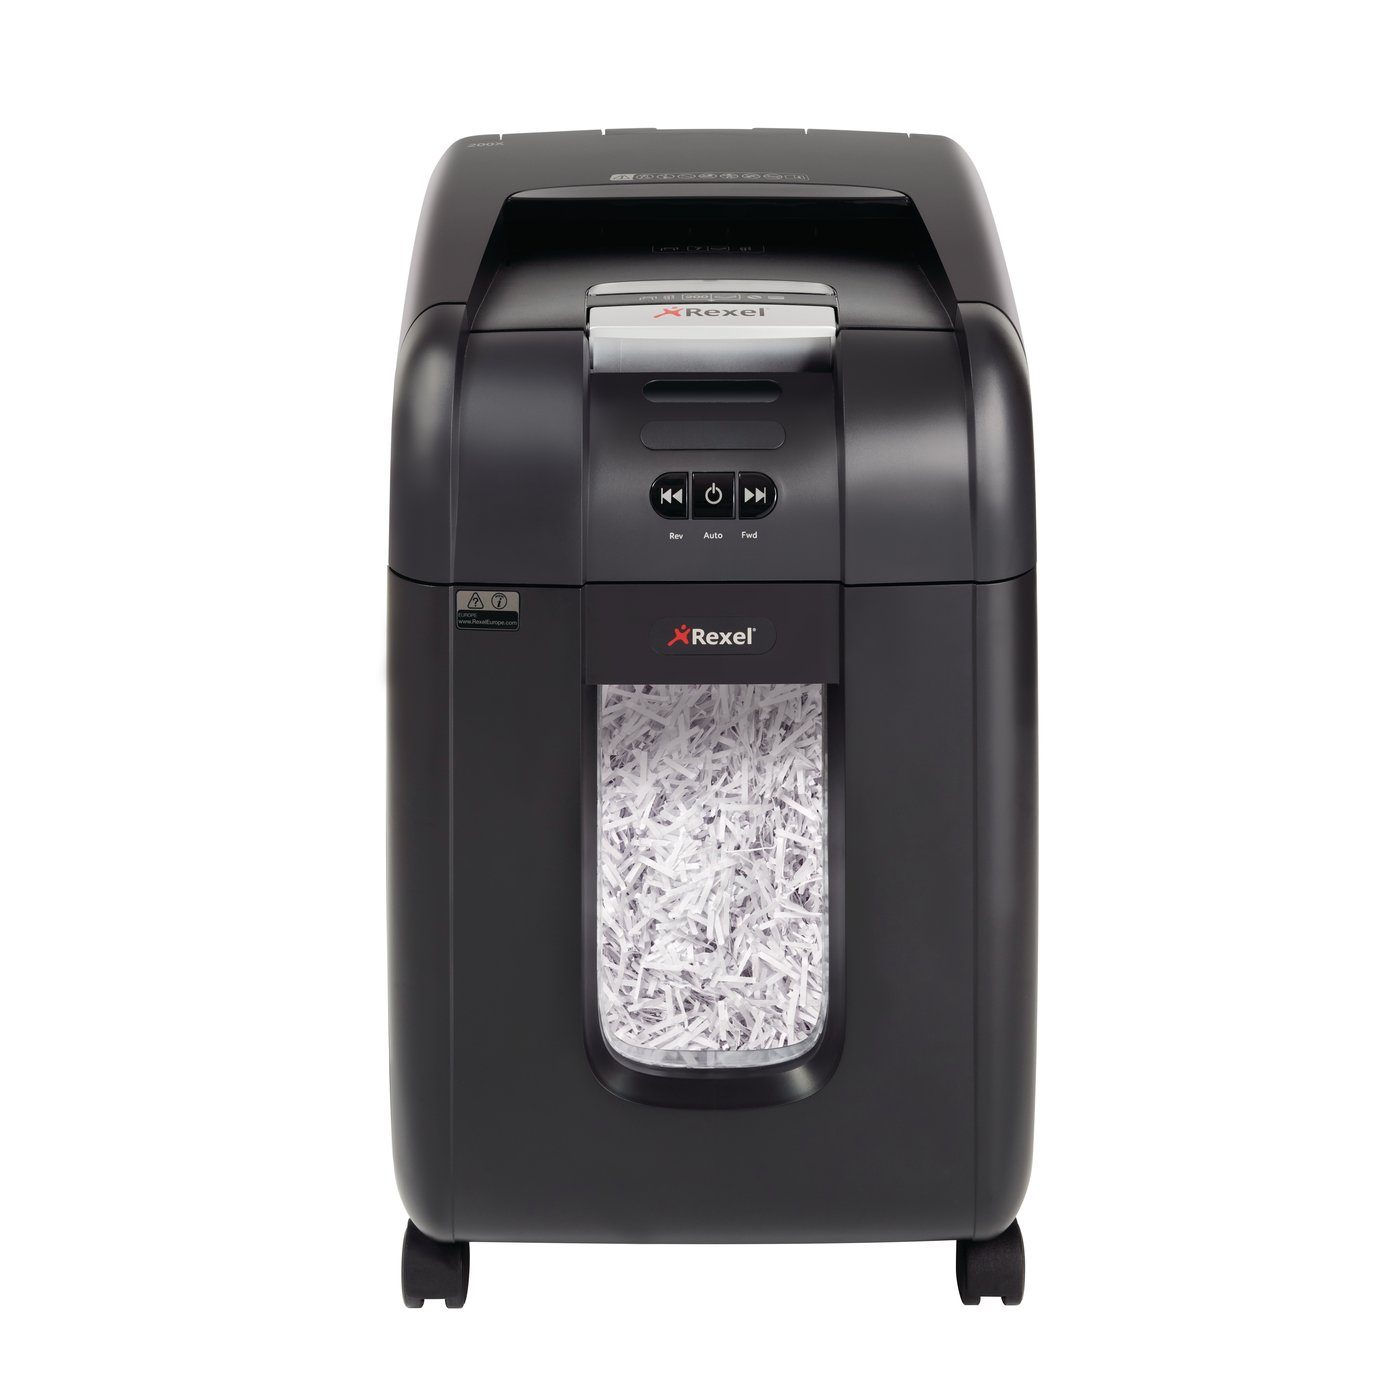 rexel products paper shredders auto feed shredders auto 200x cross cut shredder. Black Bedroom Furniture Sets. Home Design Ideas